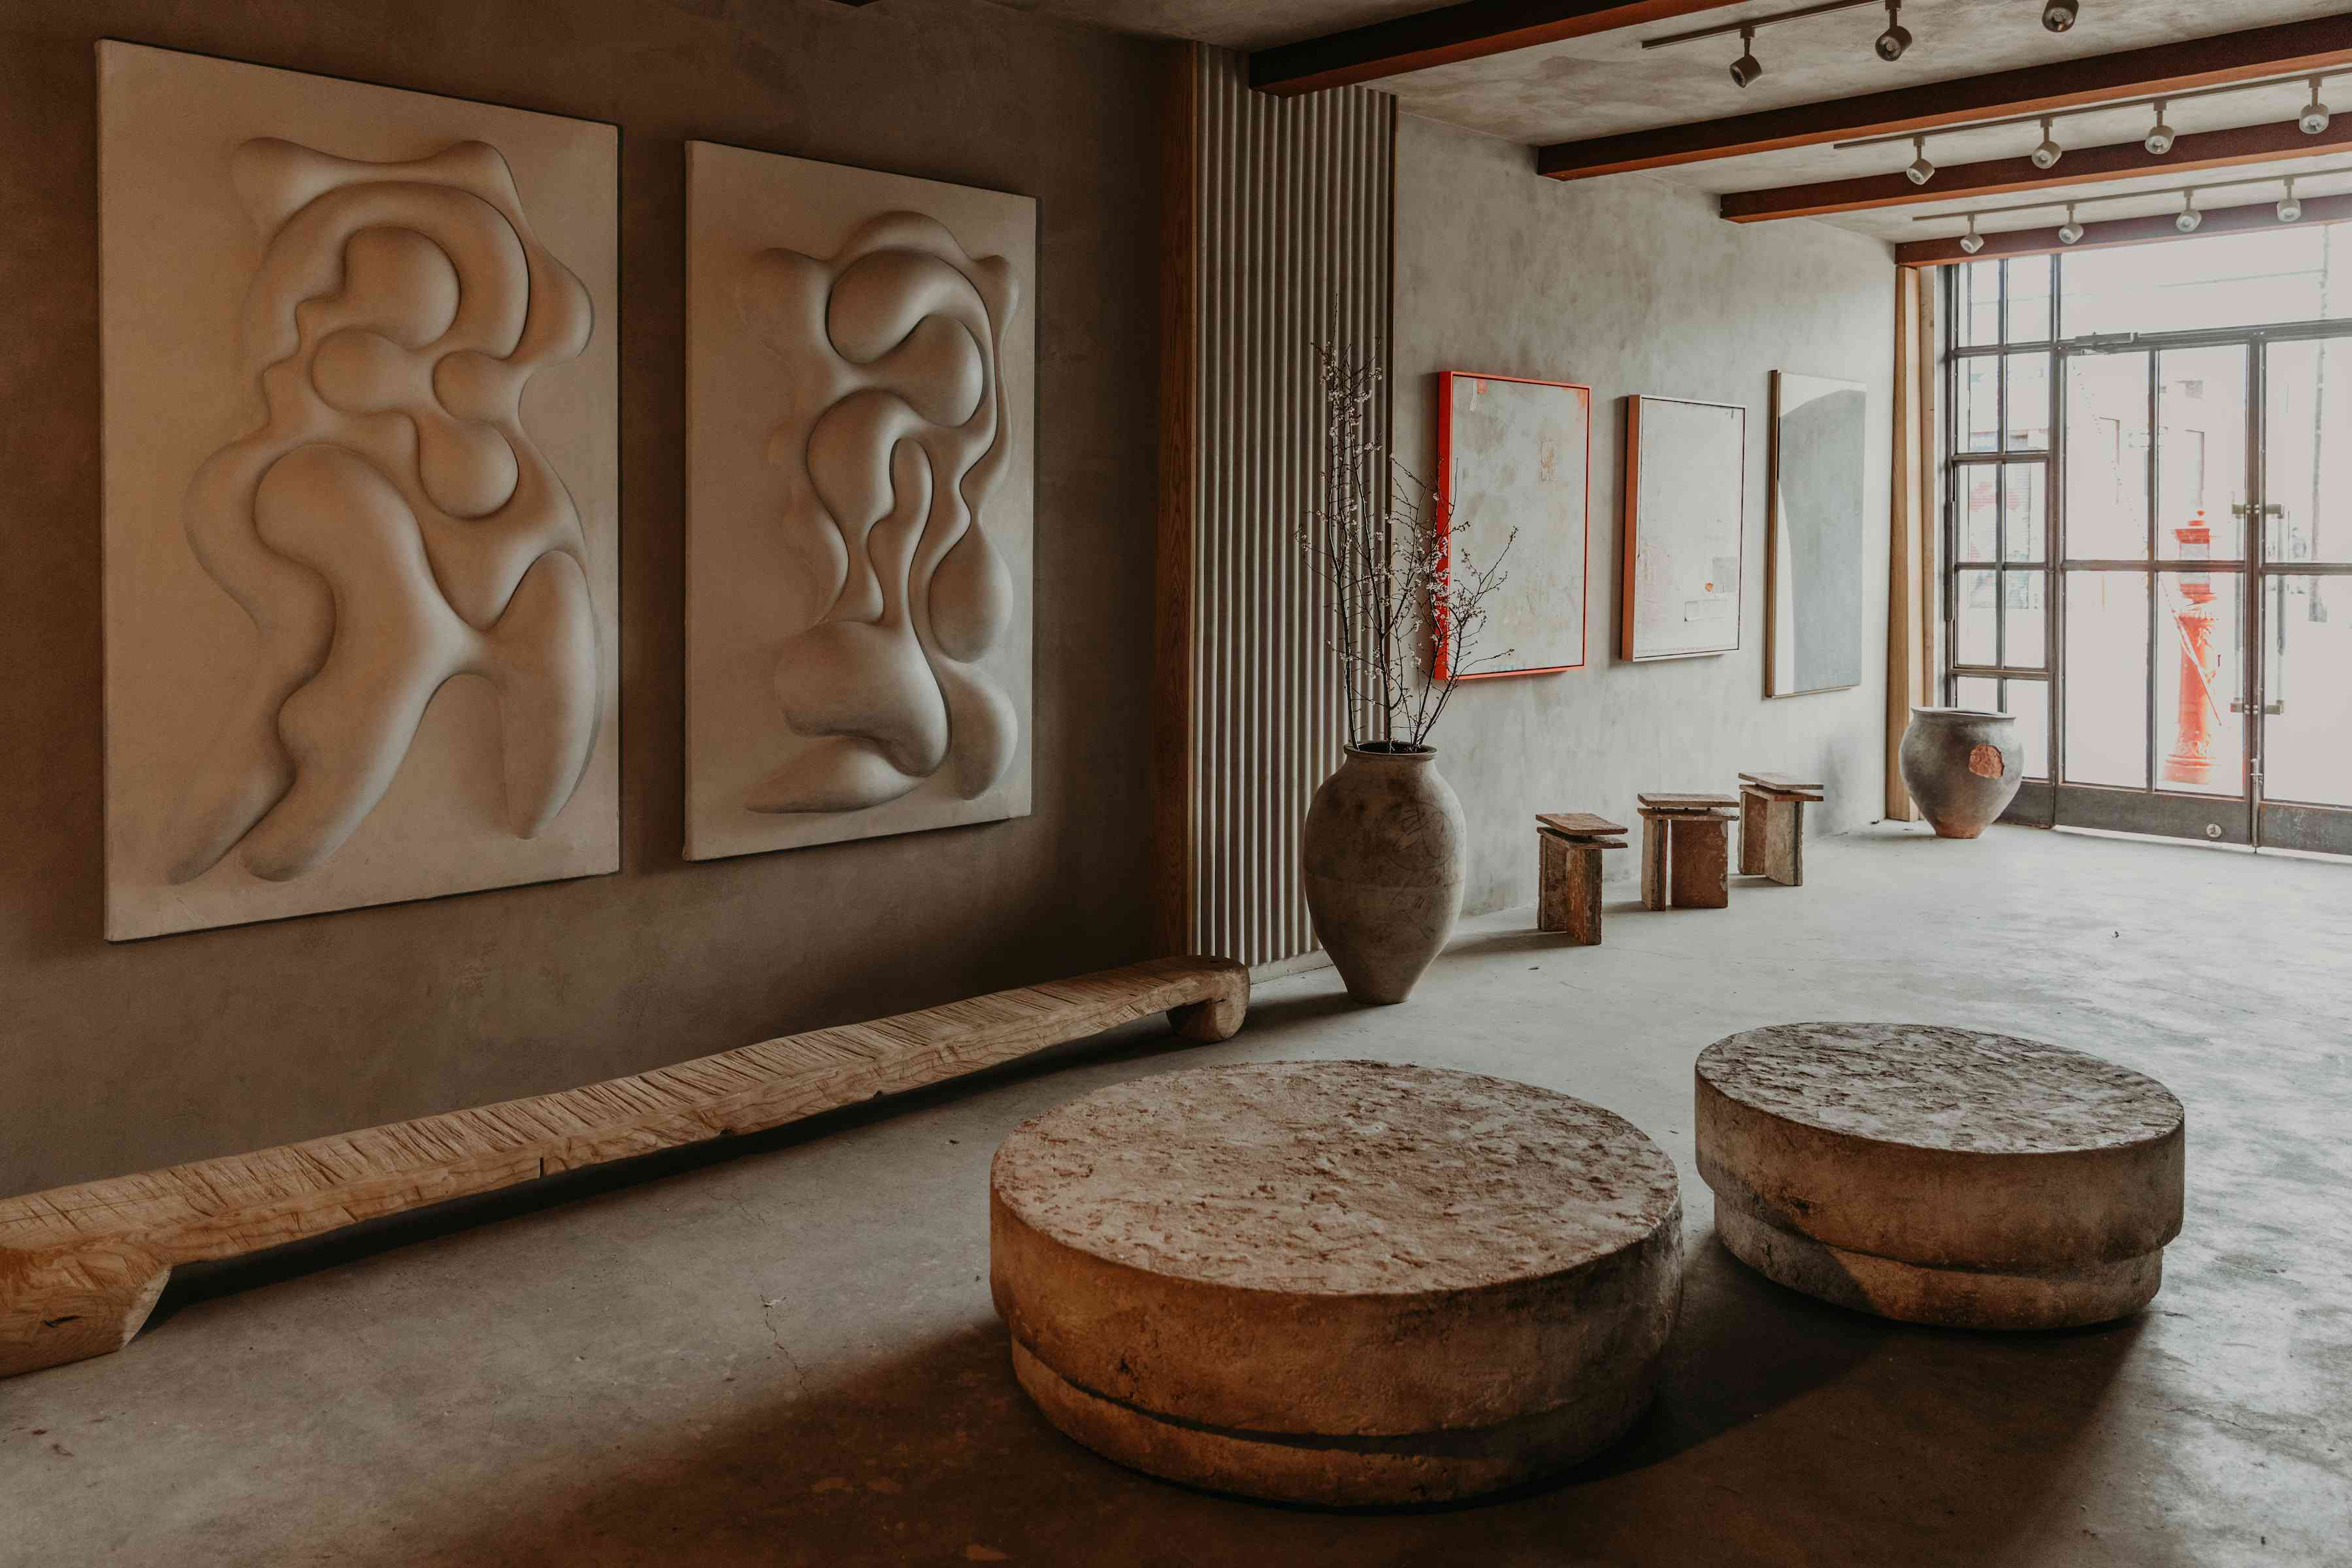 Plaster exhibit art on walls.